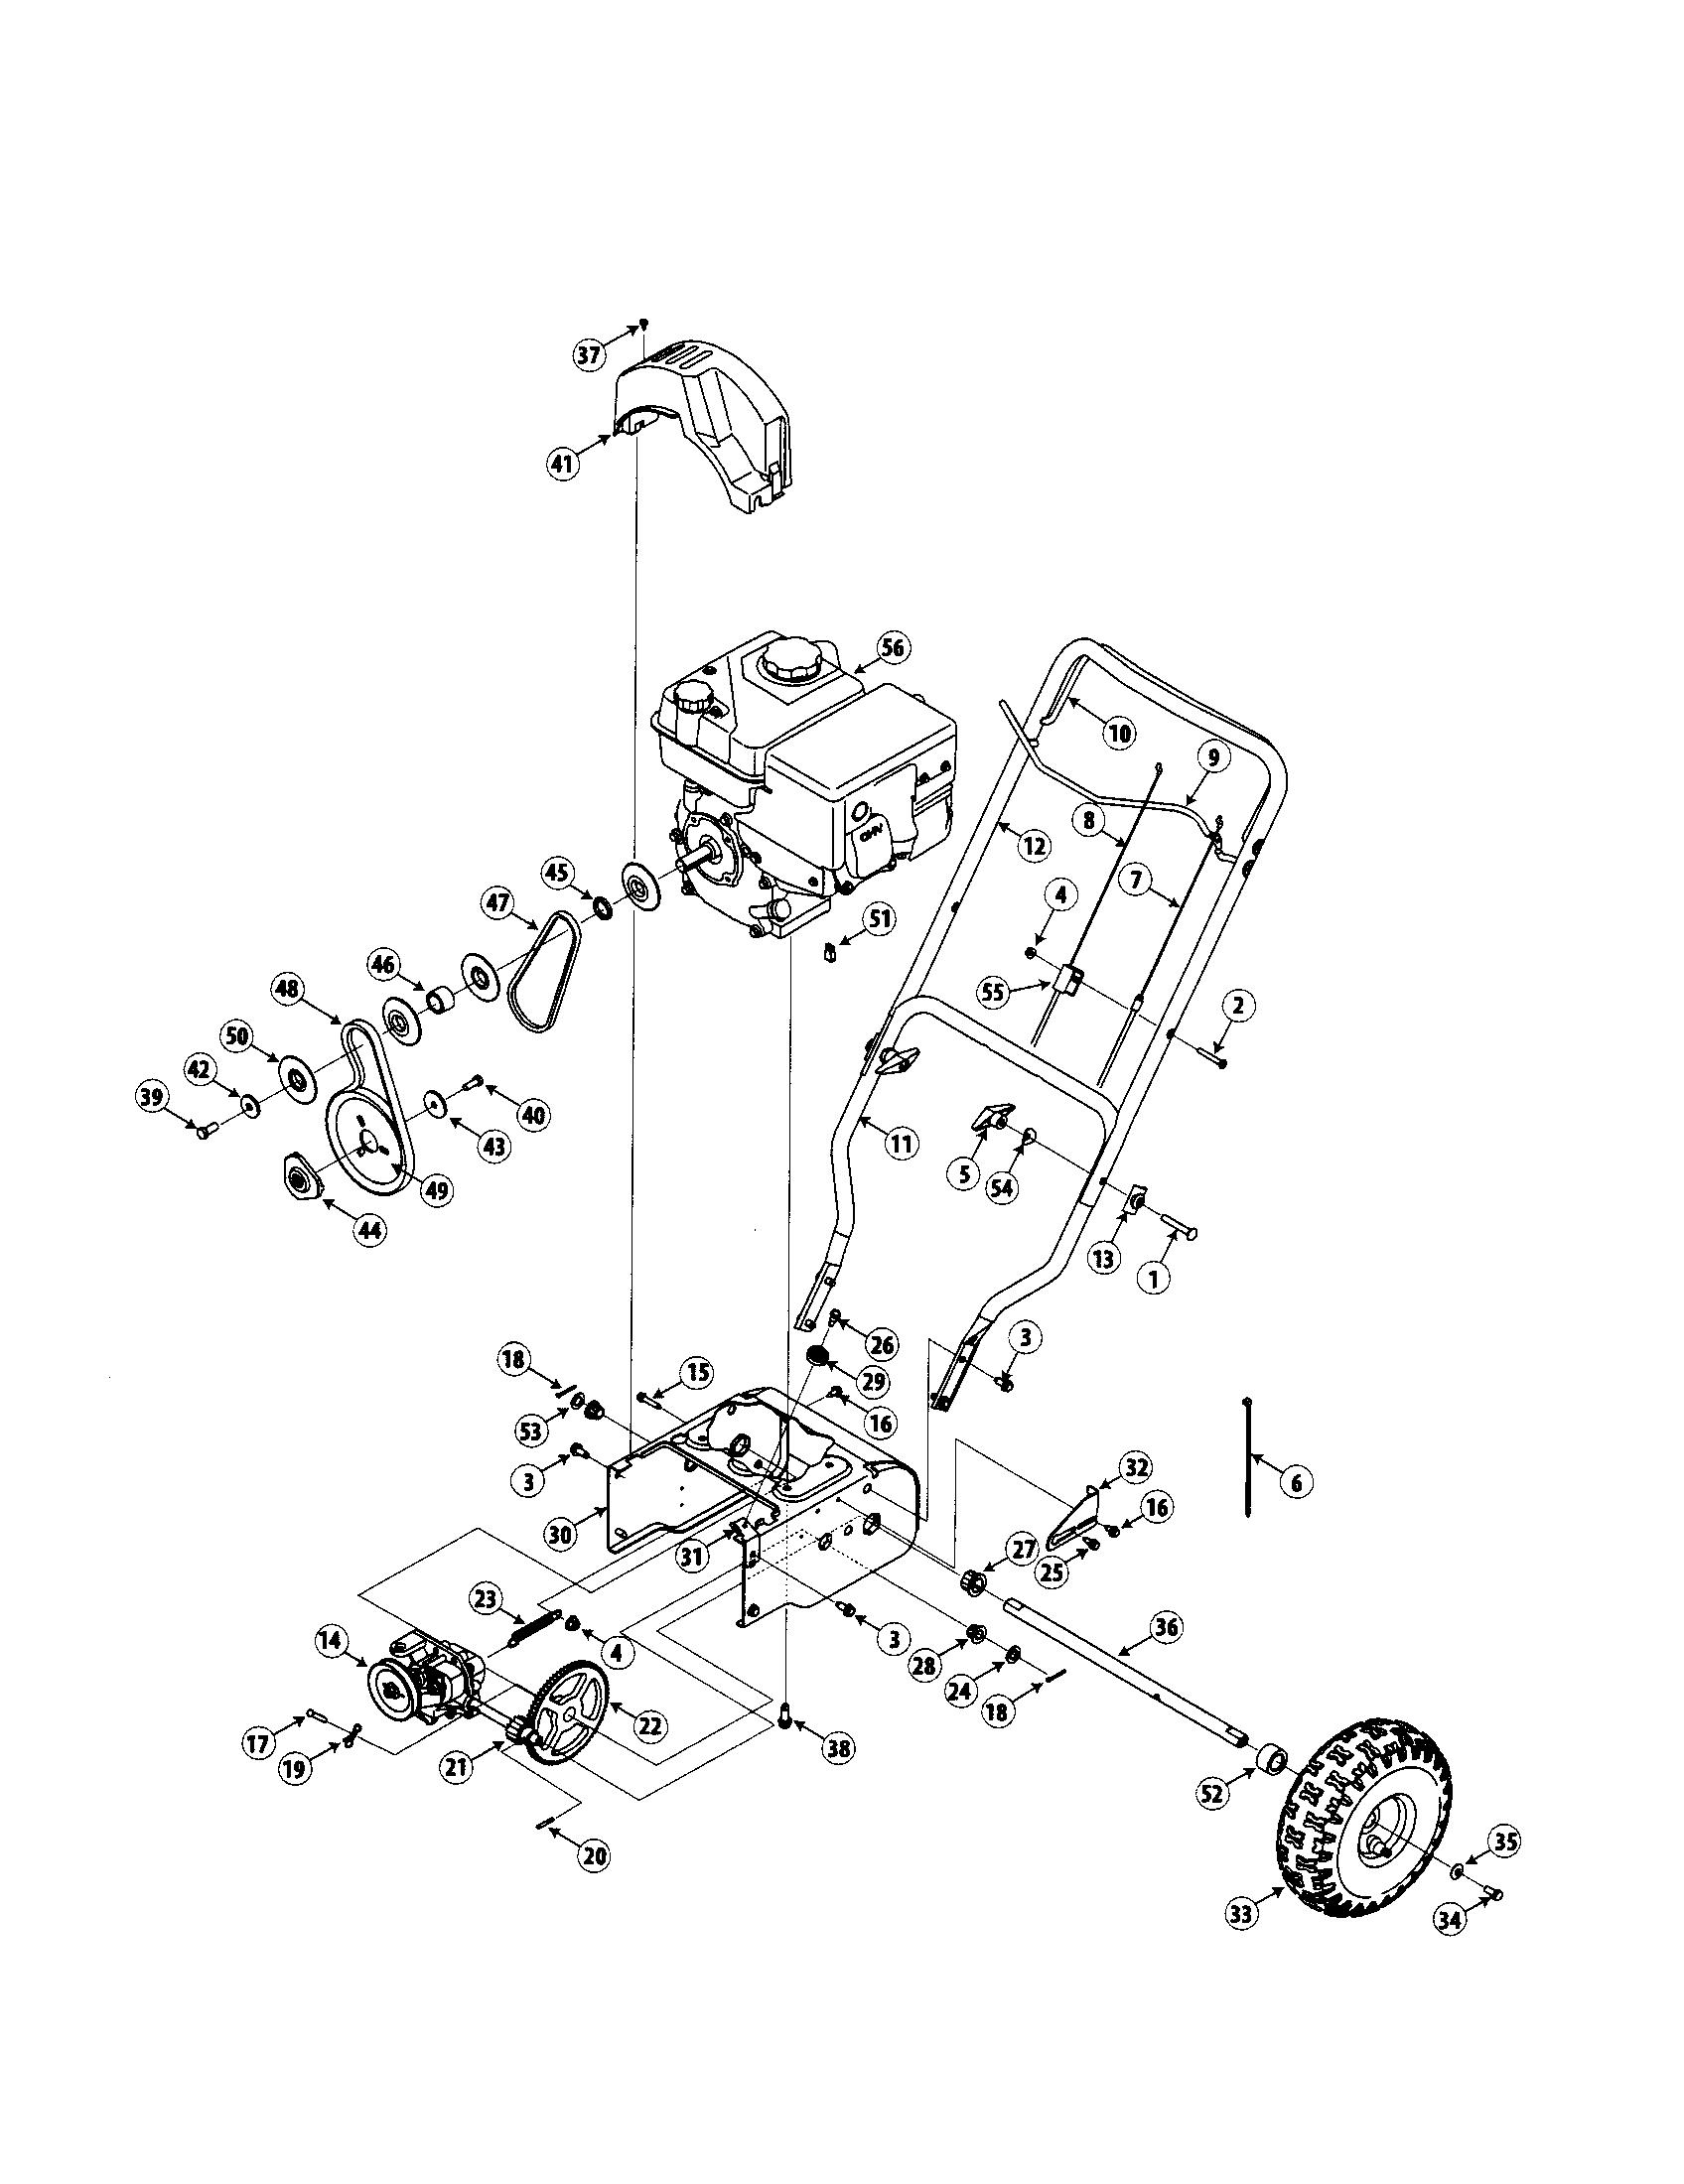 Craftsman model 247887791 snowthrower, gas genuine parts